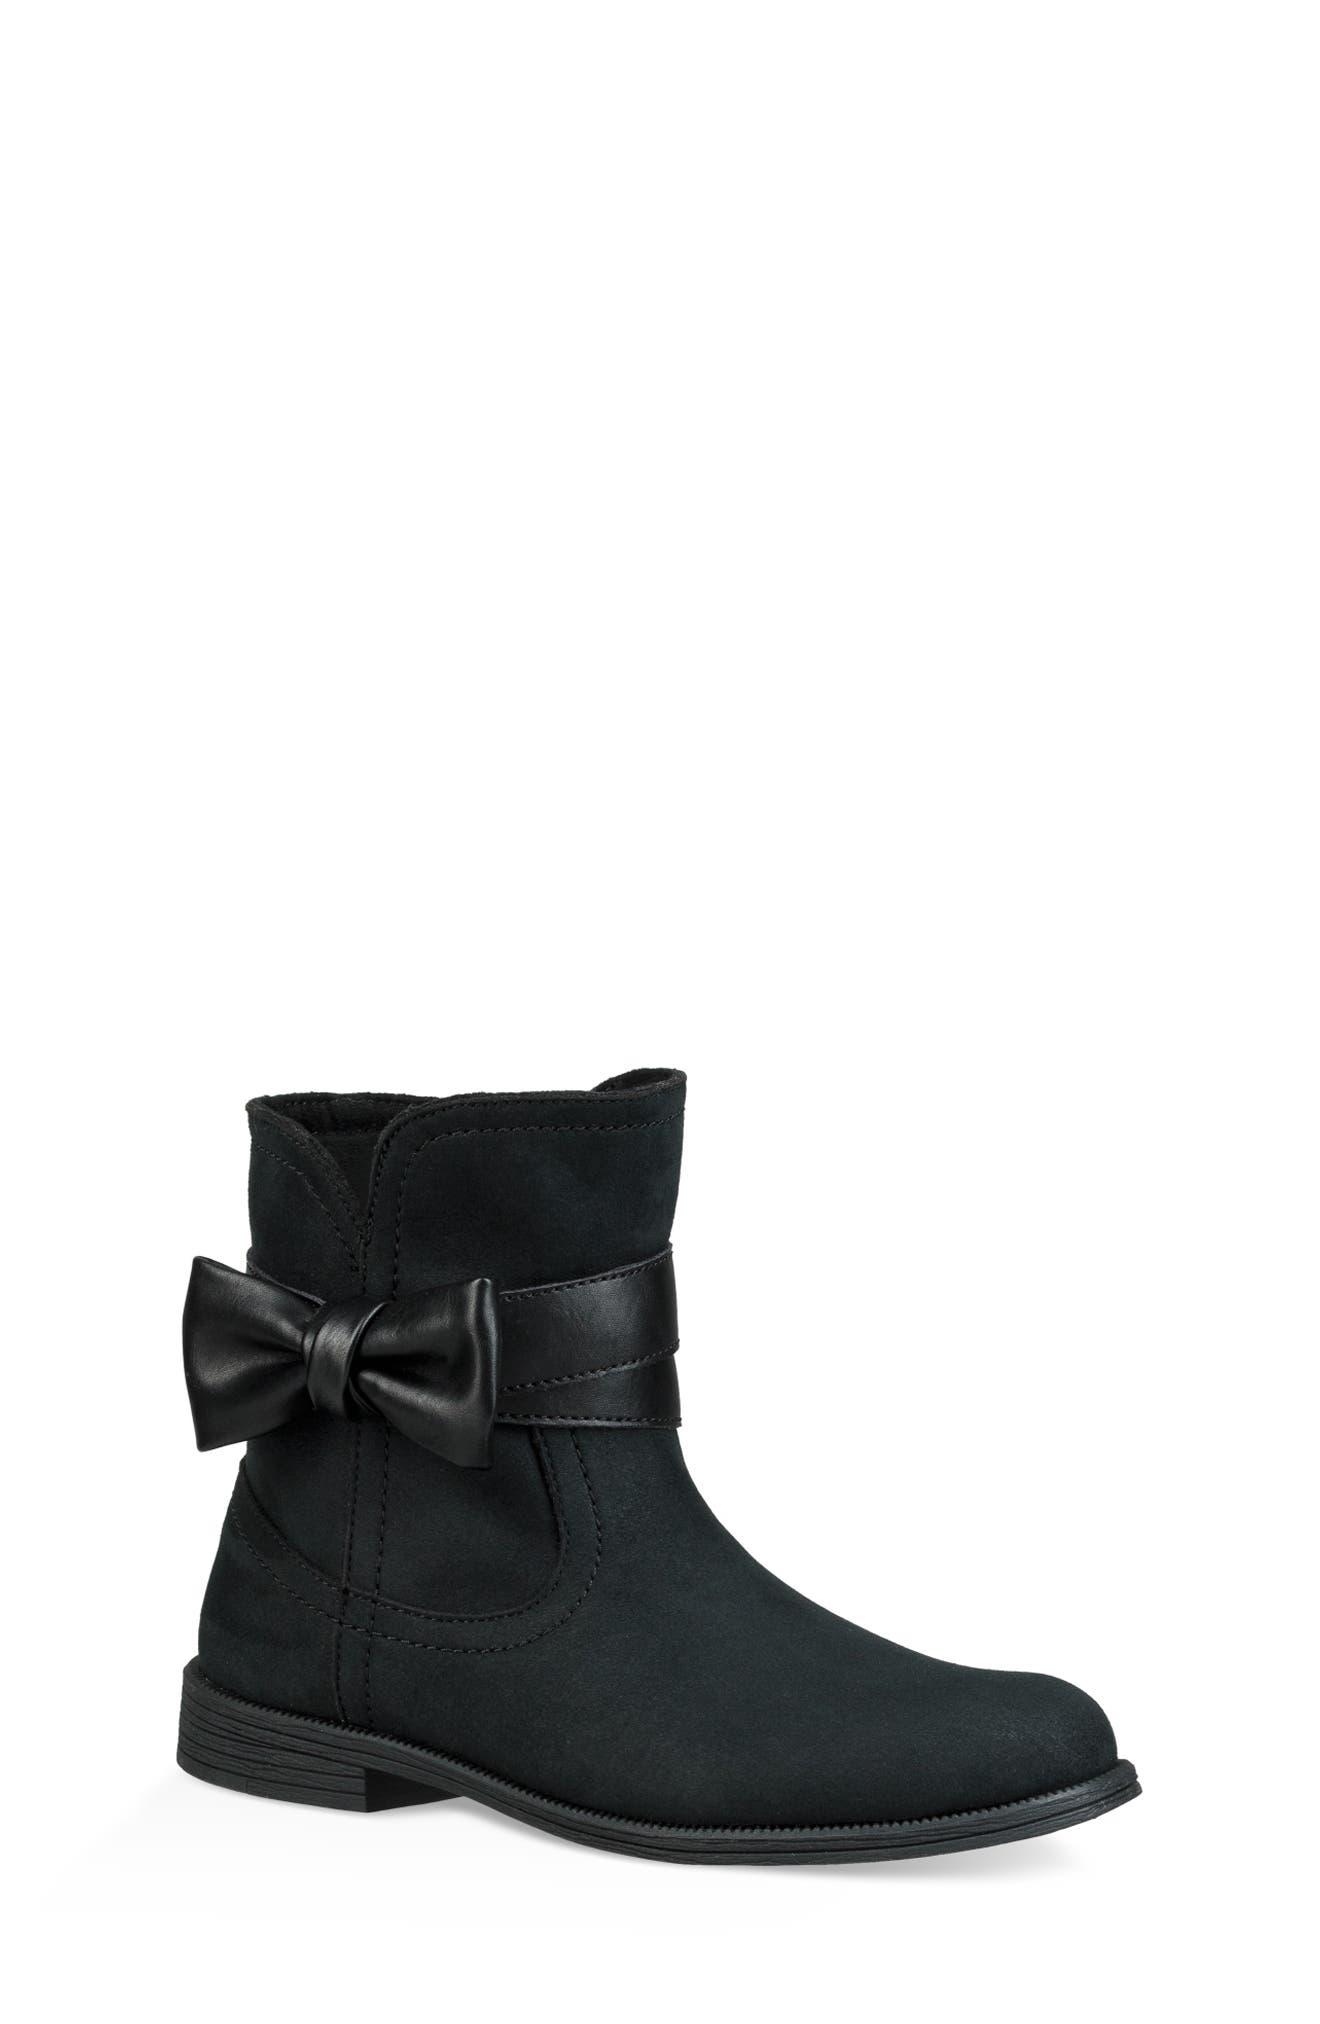 UGG<SUP>®</SUP> UGG Joanie Bow Boot, Main, color, BLACK